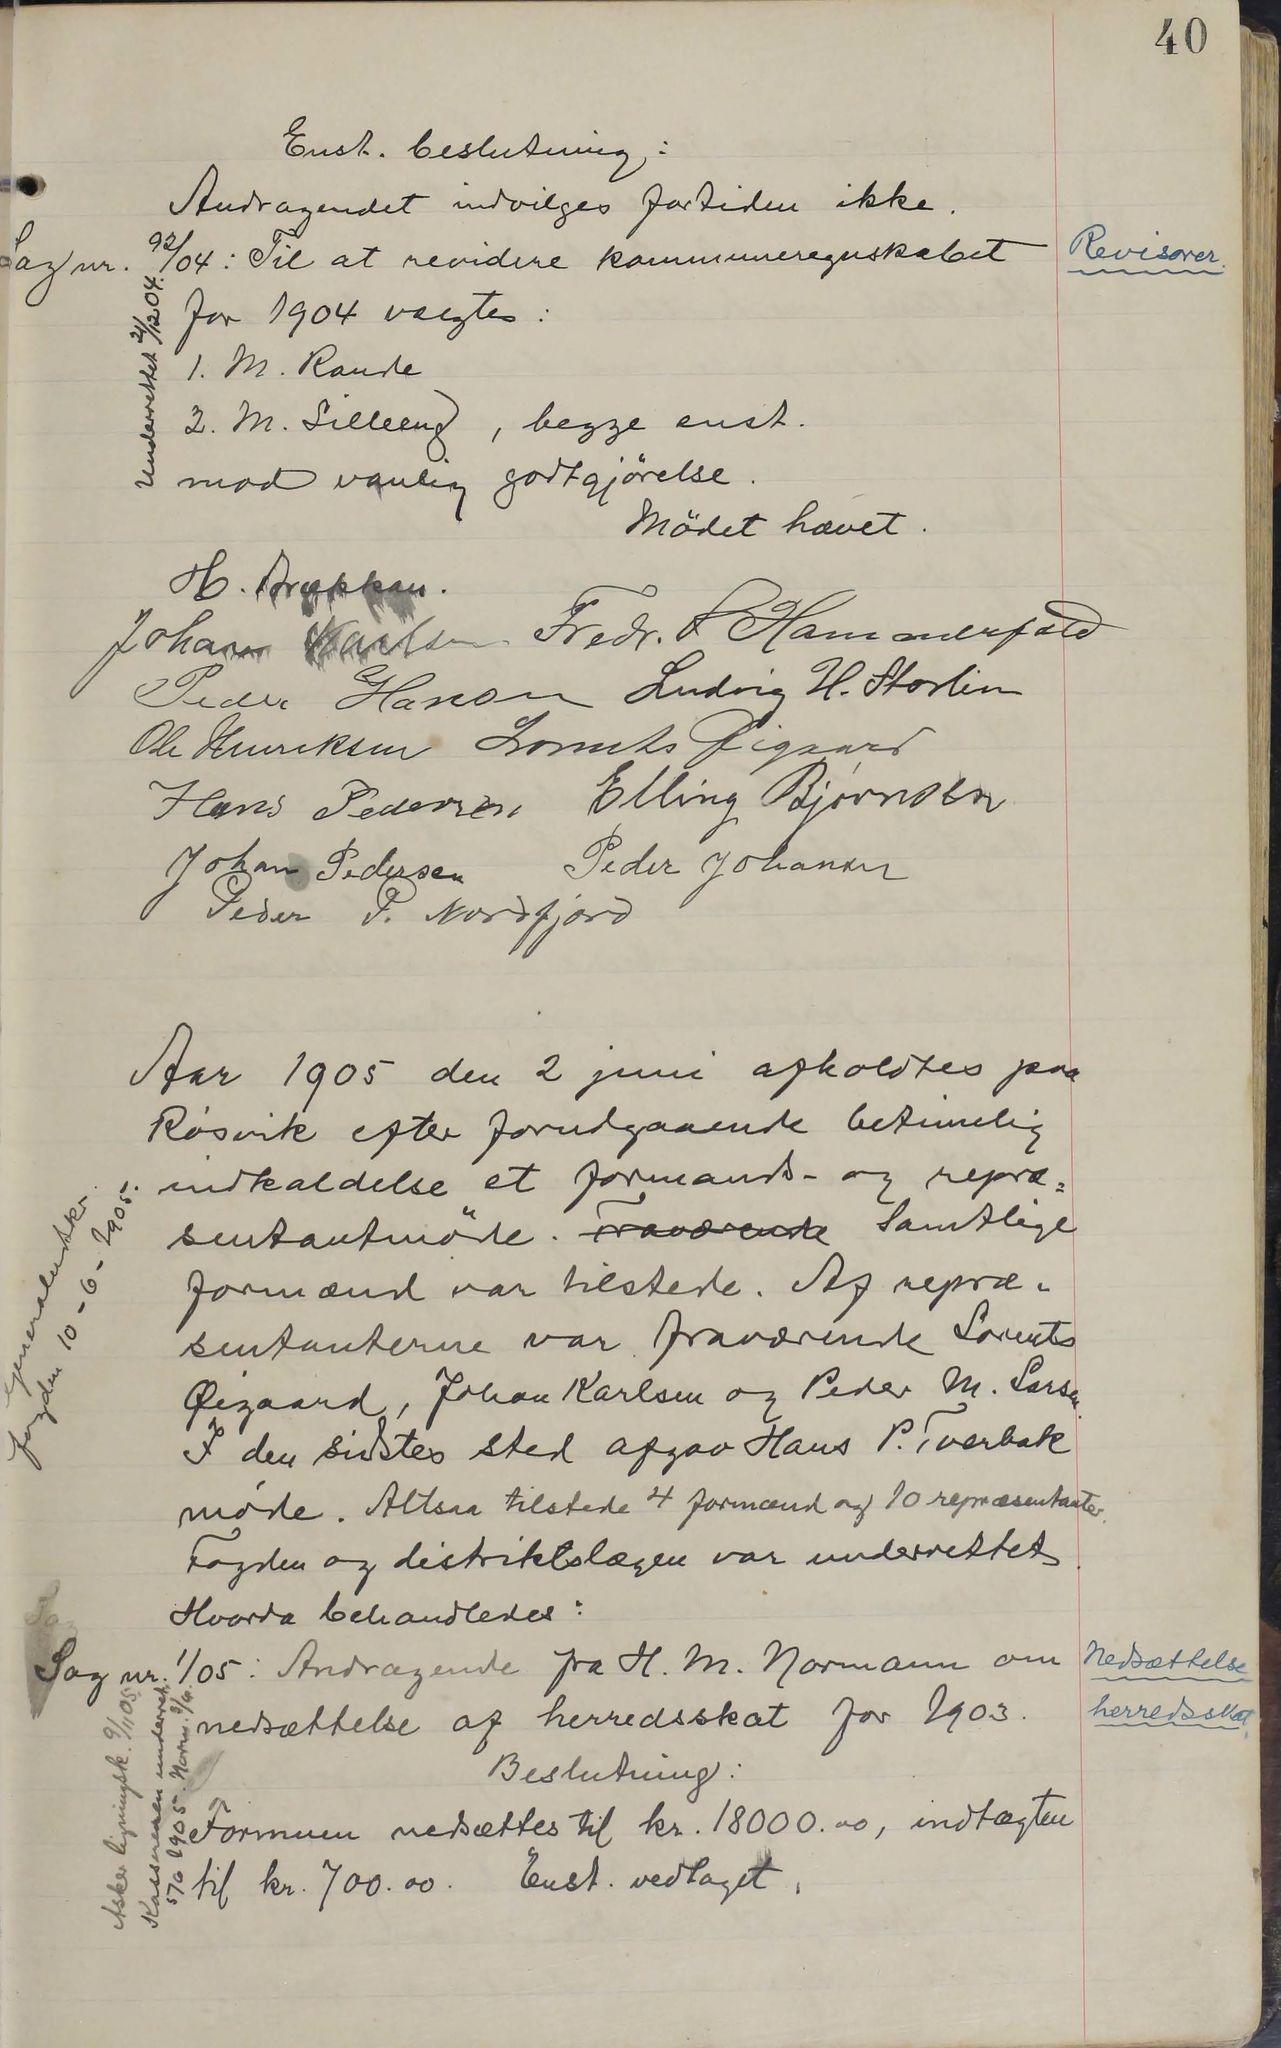 AIN, Sørfold kommune. Formannskap, 100/L0002: Forhandlingsprotokol for Sørfoldens formandskab, 1902-1913, s. 40